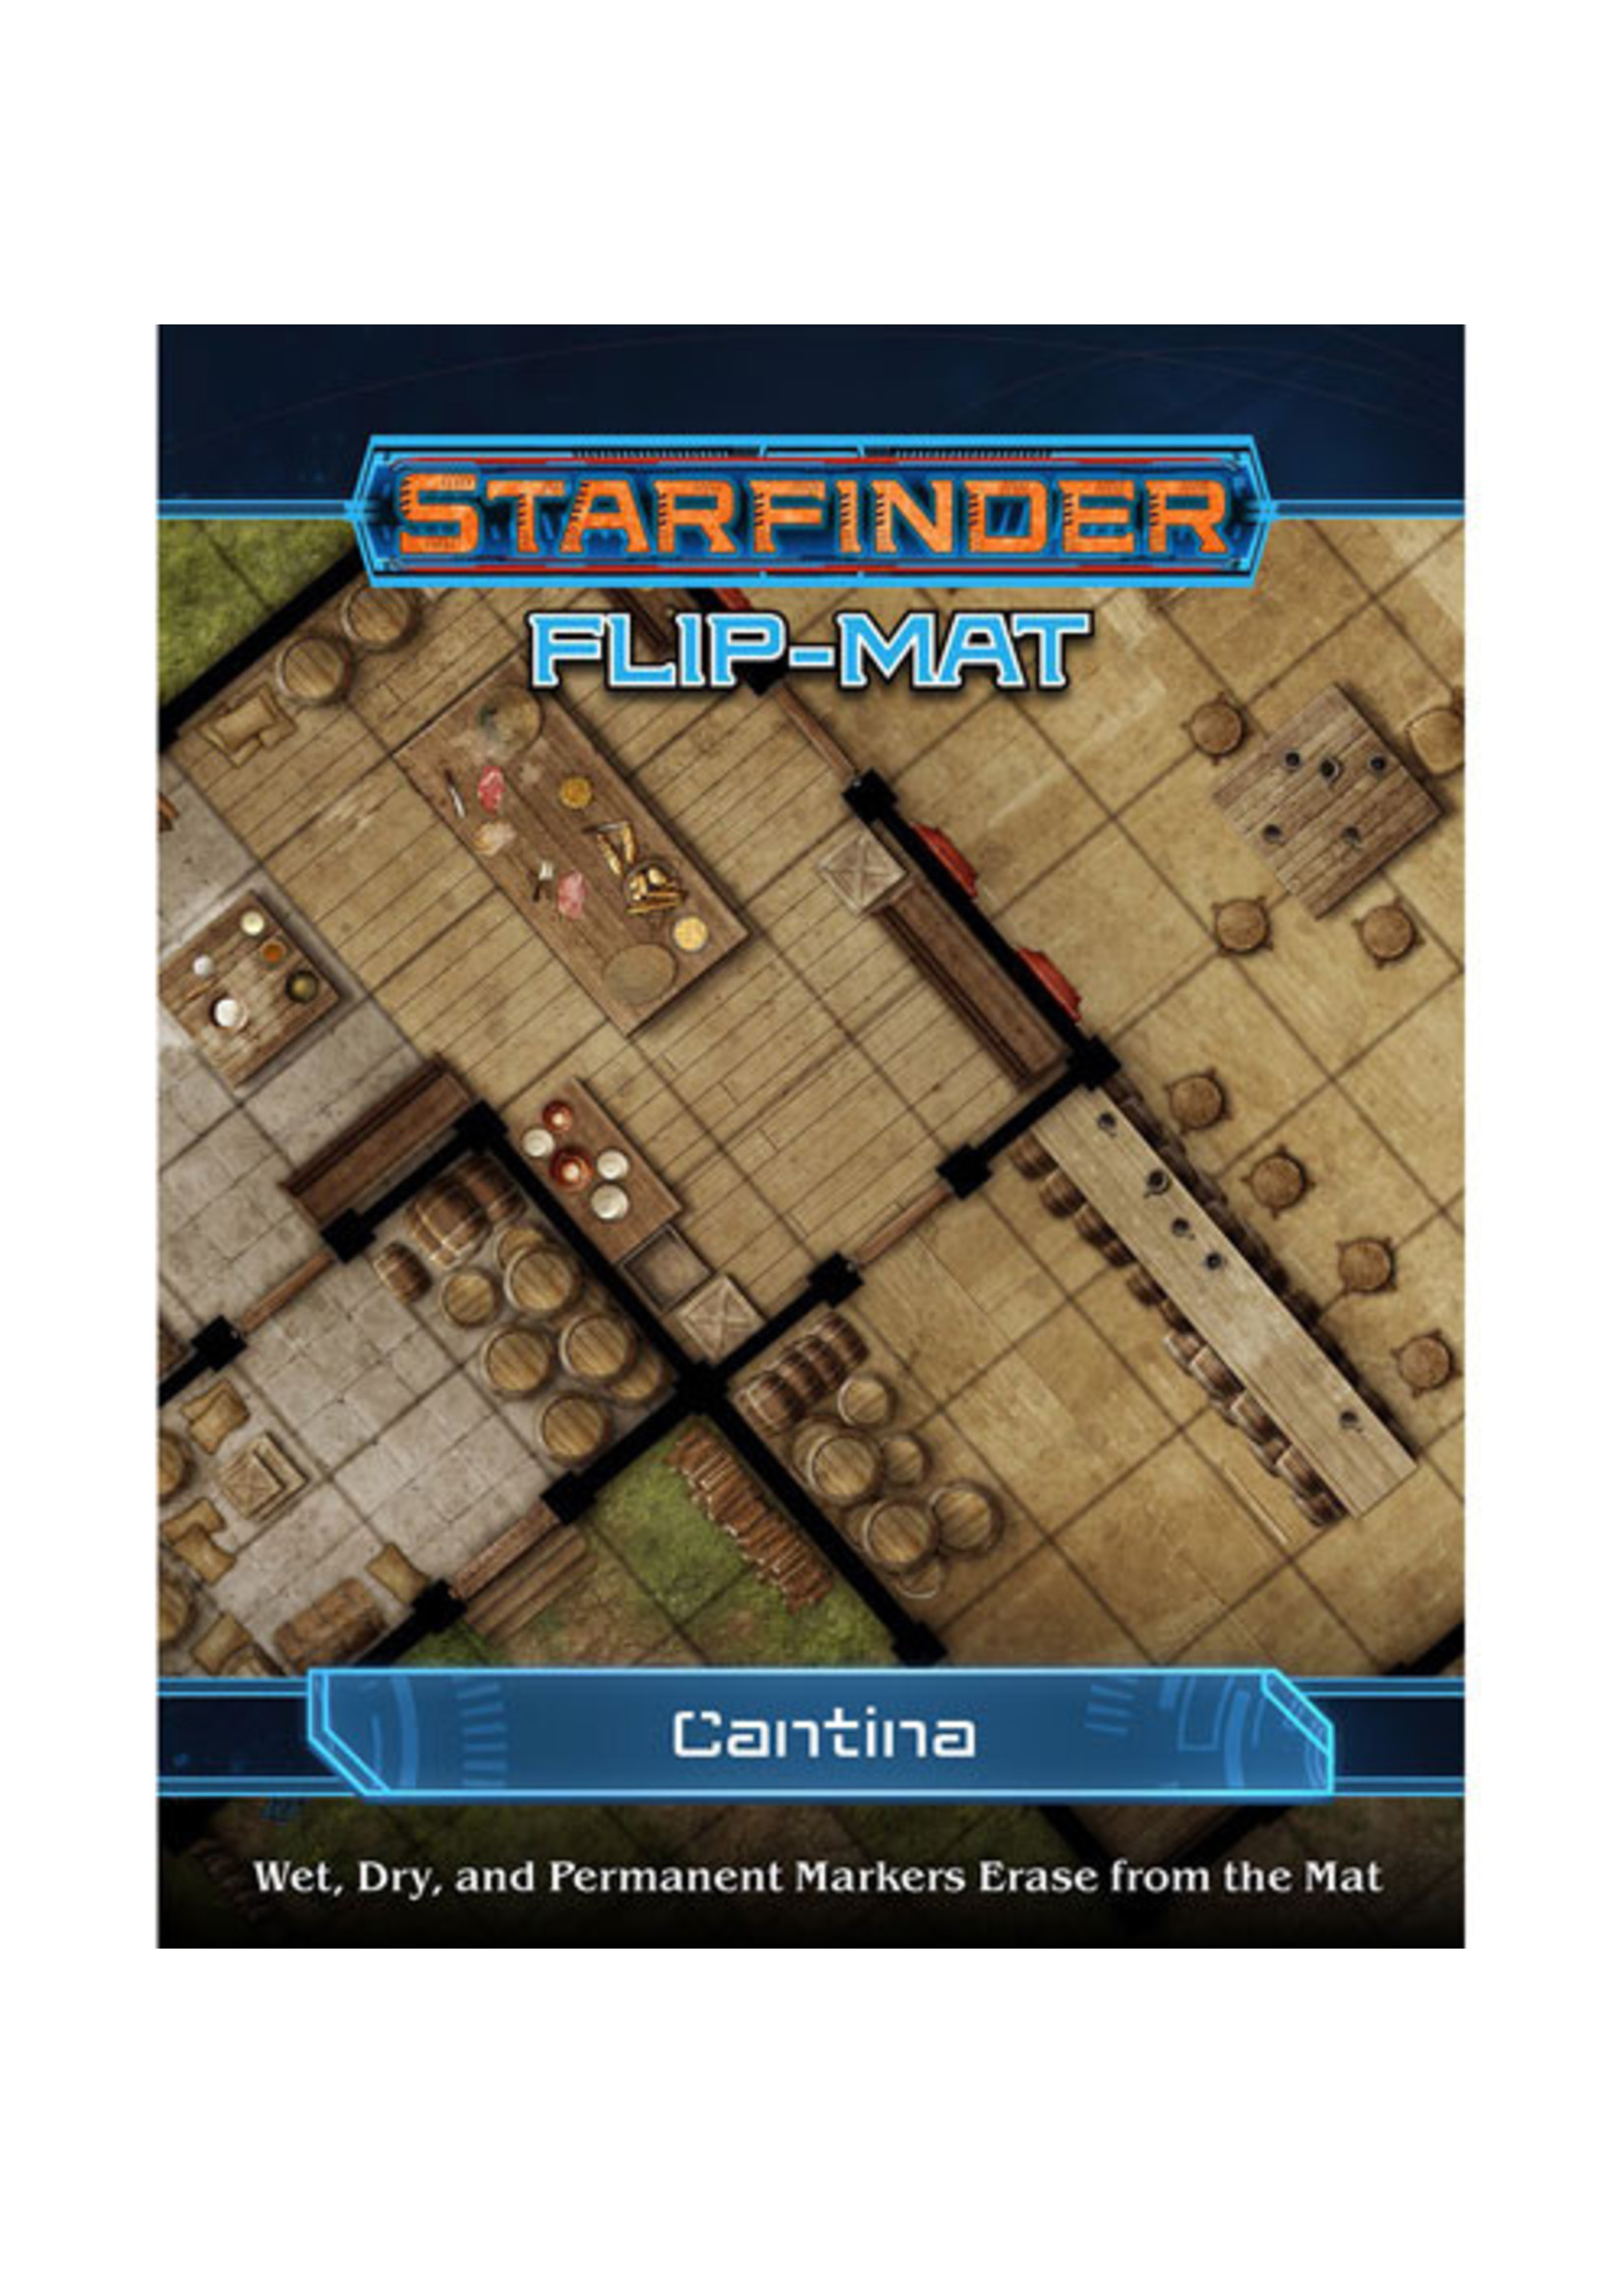 Starfinder RPG: Flip-Mat - Cantina